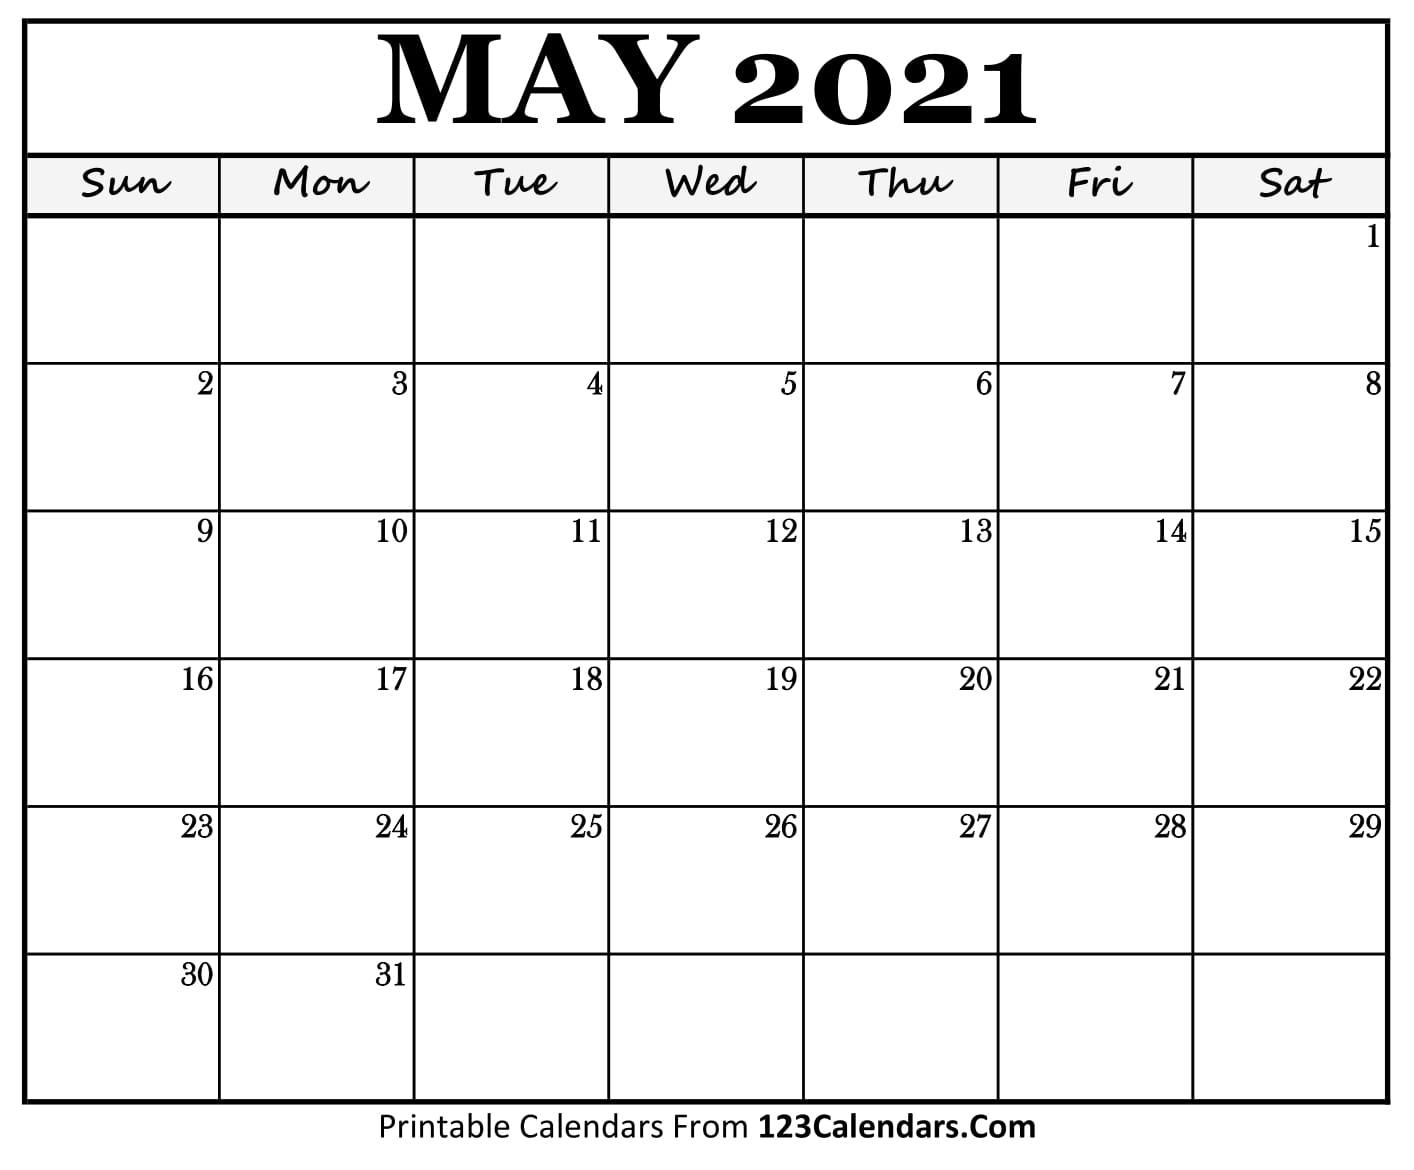 Printable May 2021 Calendar Templates   123Calendars